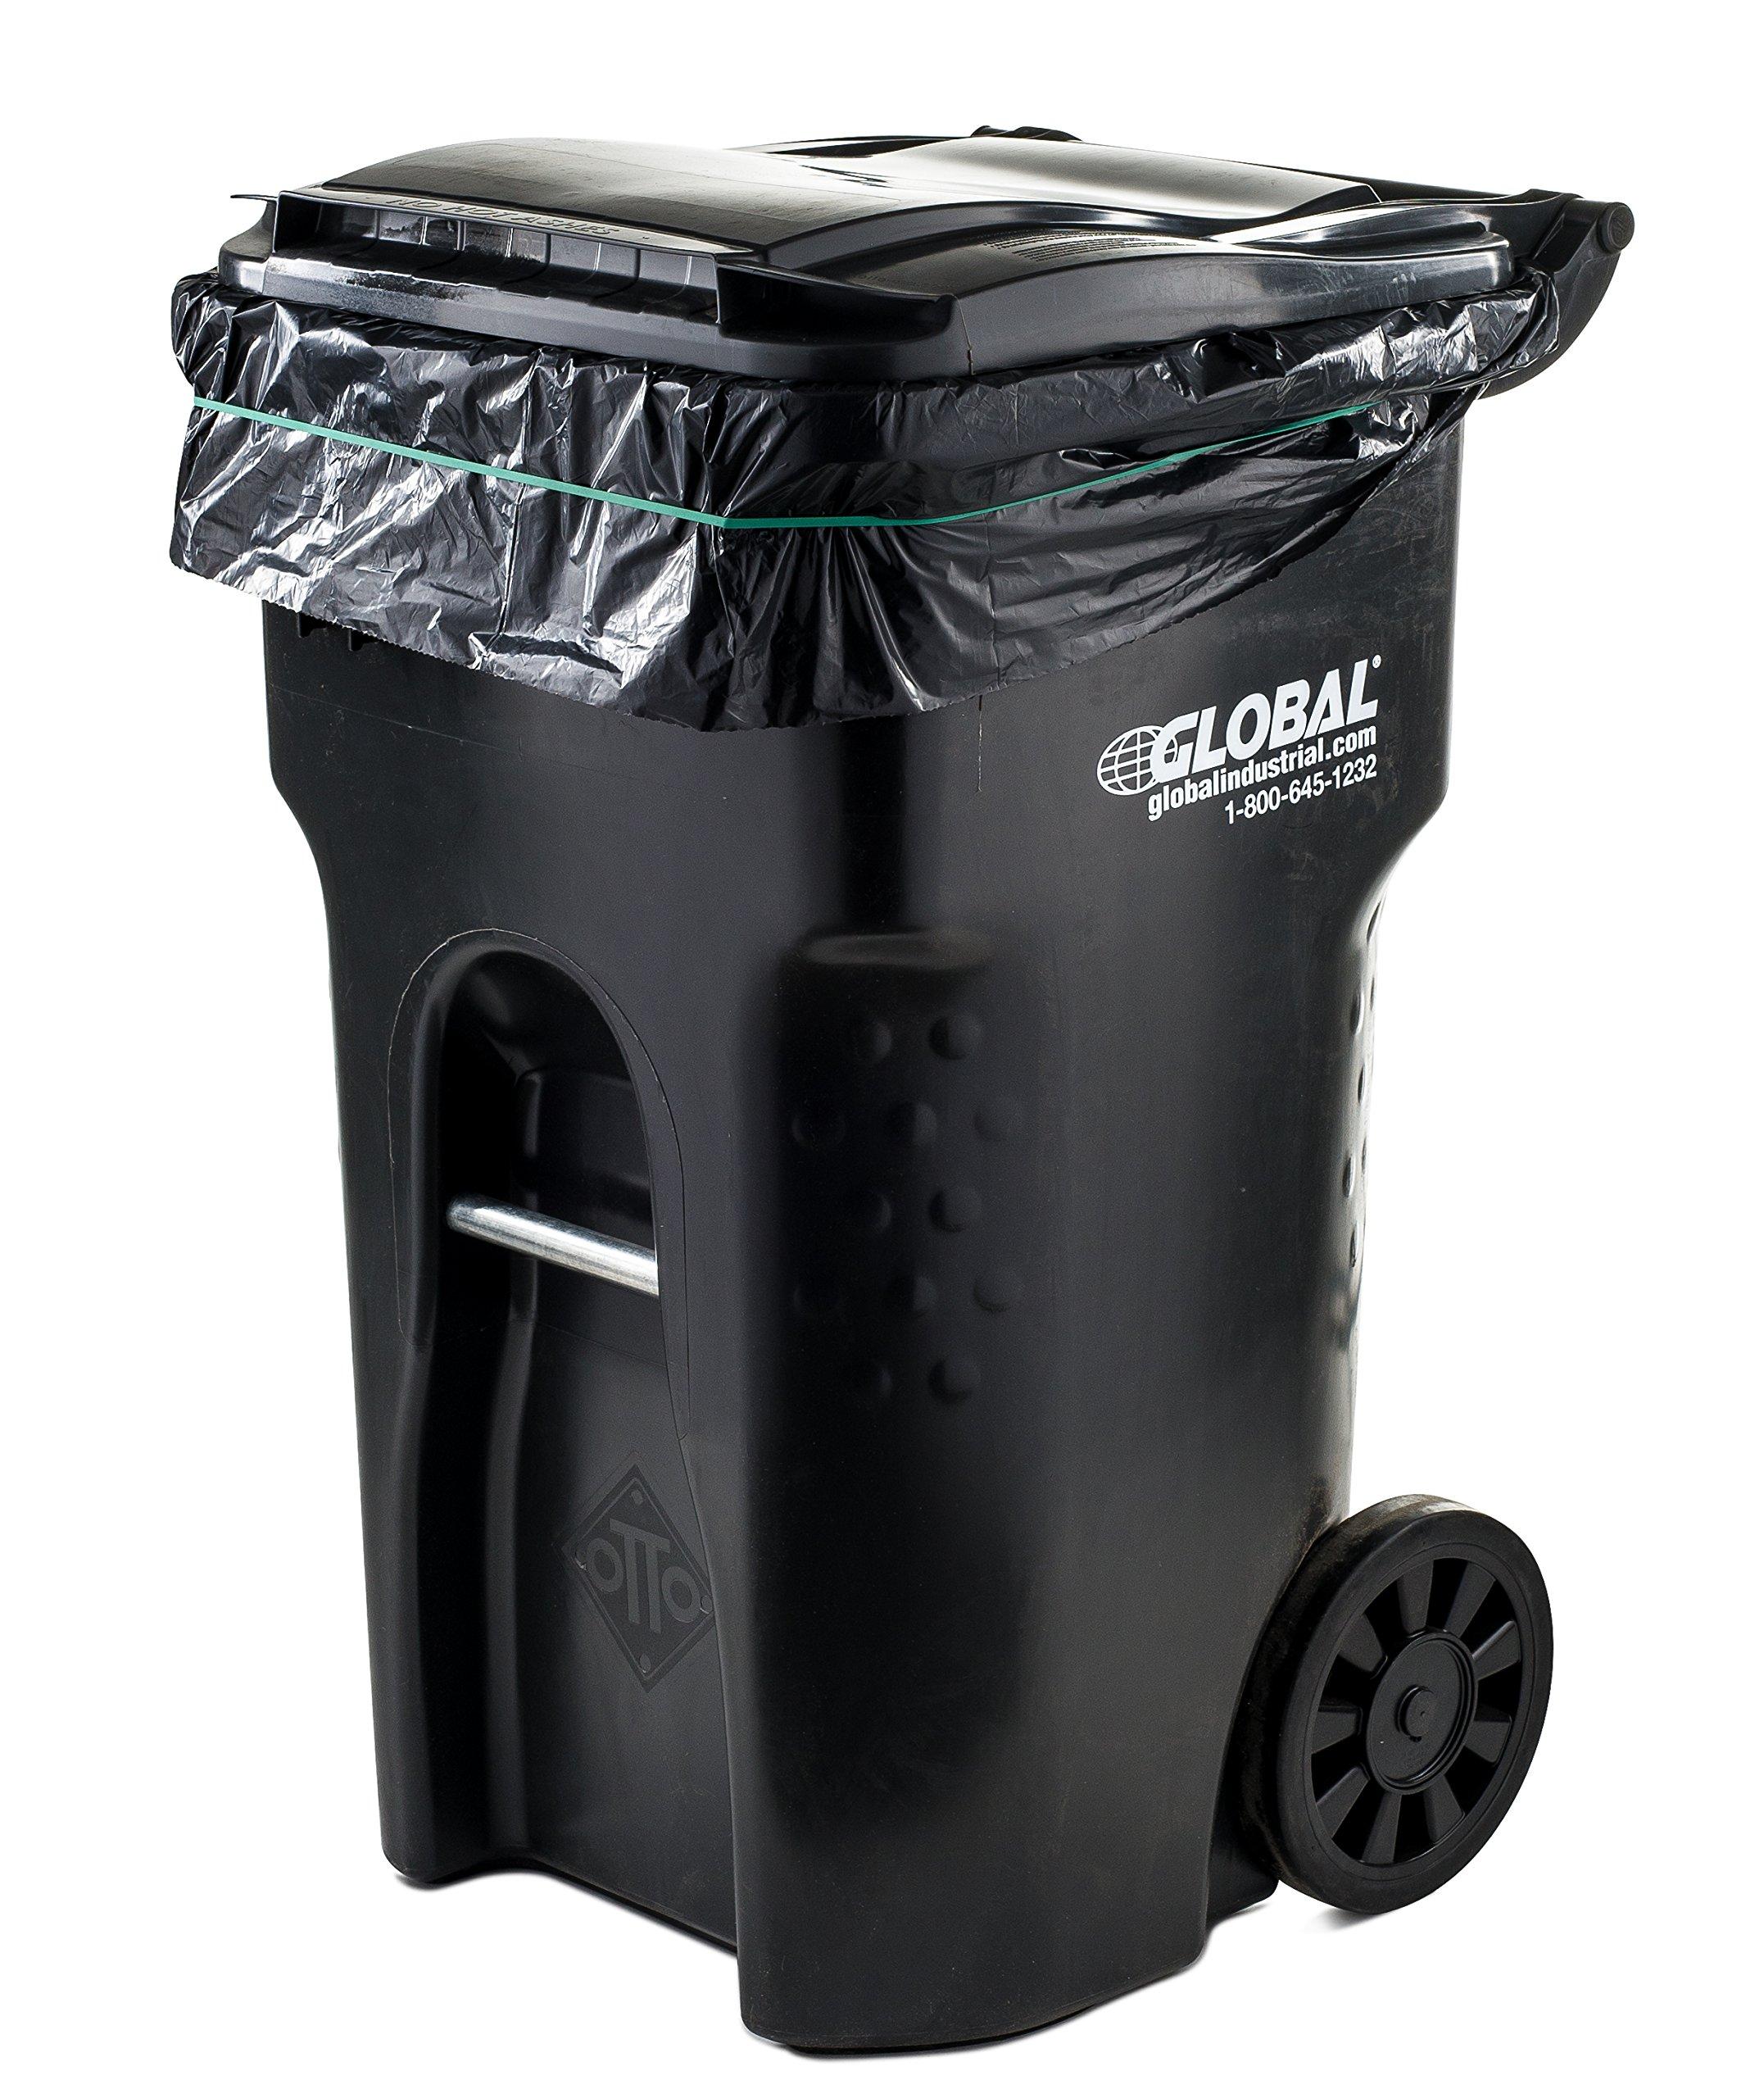 95 gallon trash bags 25 case black plasticplace ebay. Black Bedroom Furniture Sets. Home Design Ideas